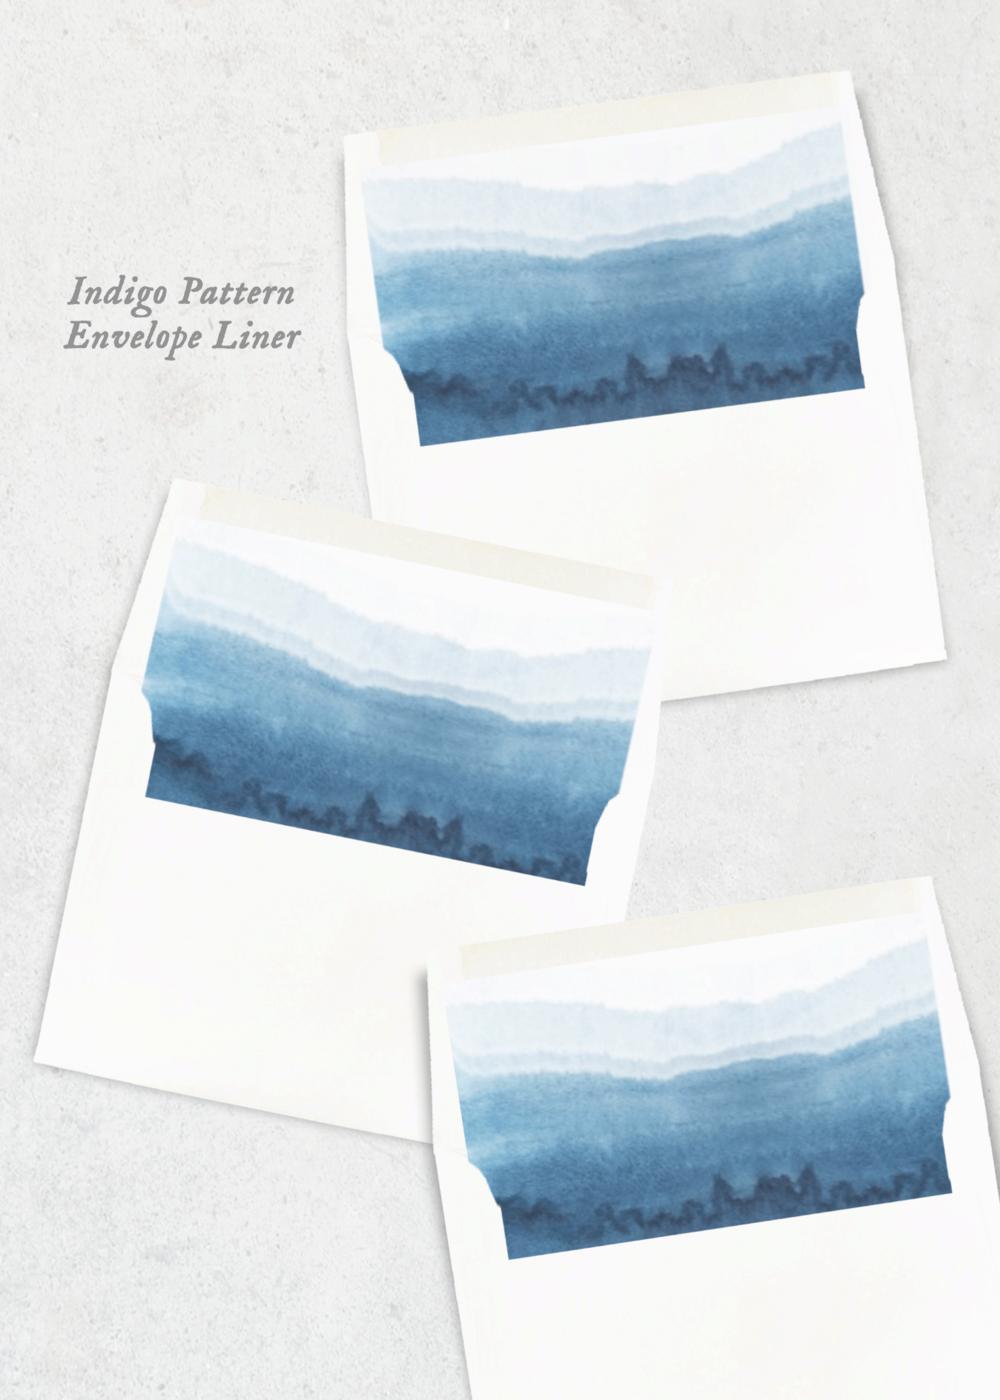 Squ-Env-Liner-indigo-dip-pattern-pp.png